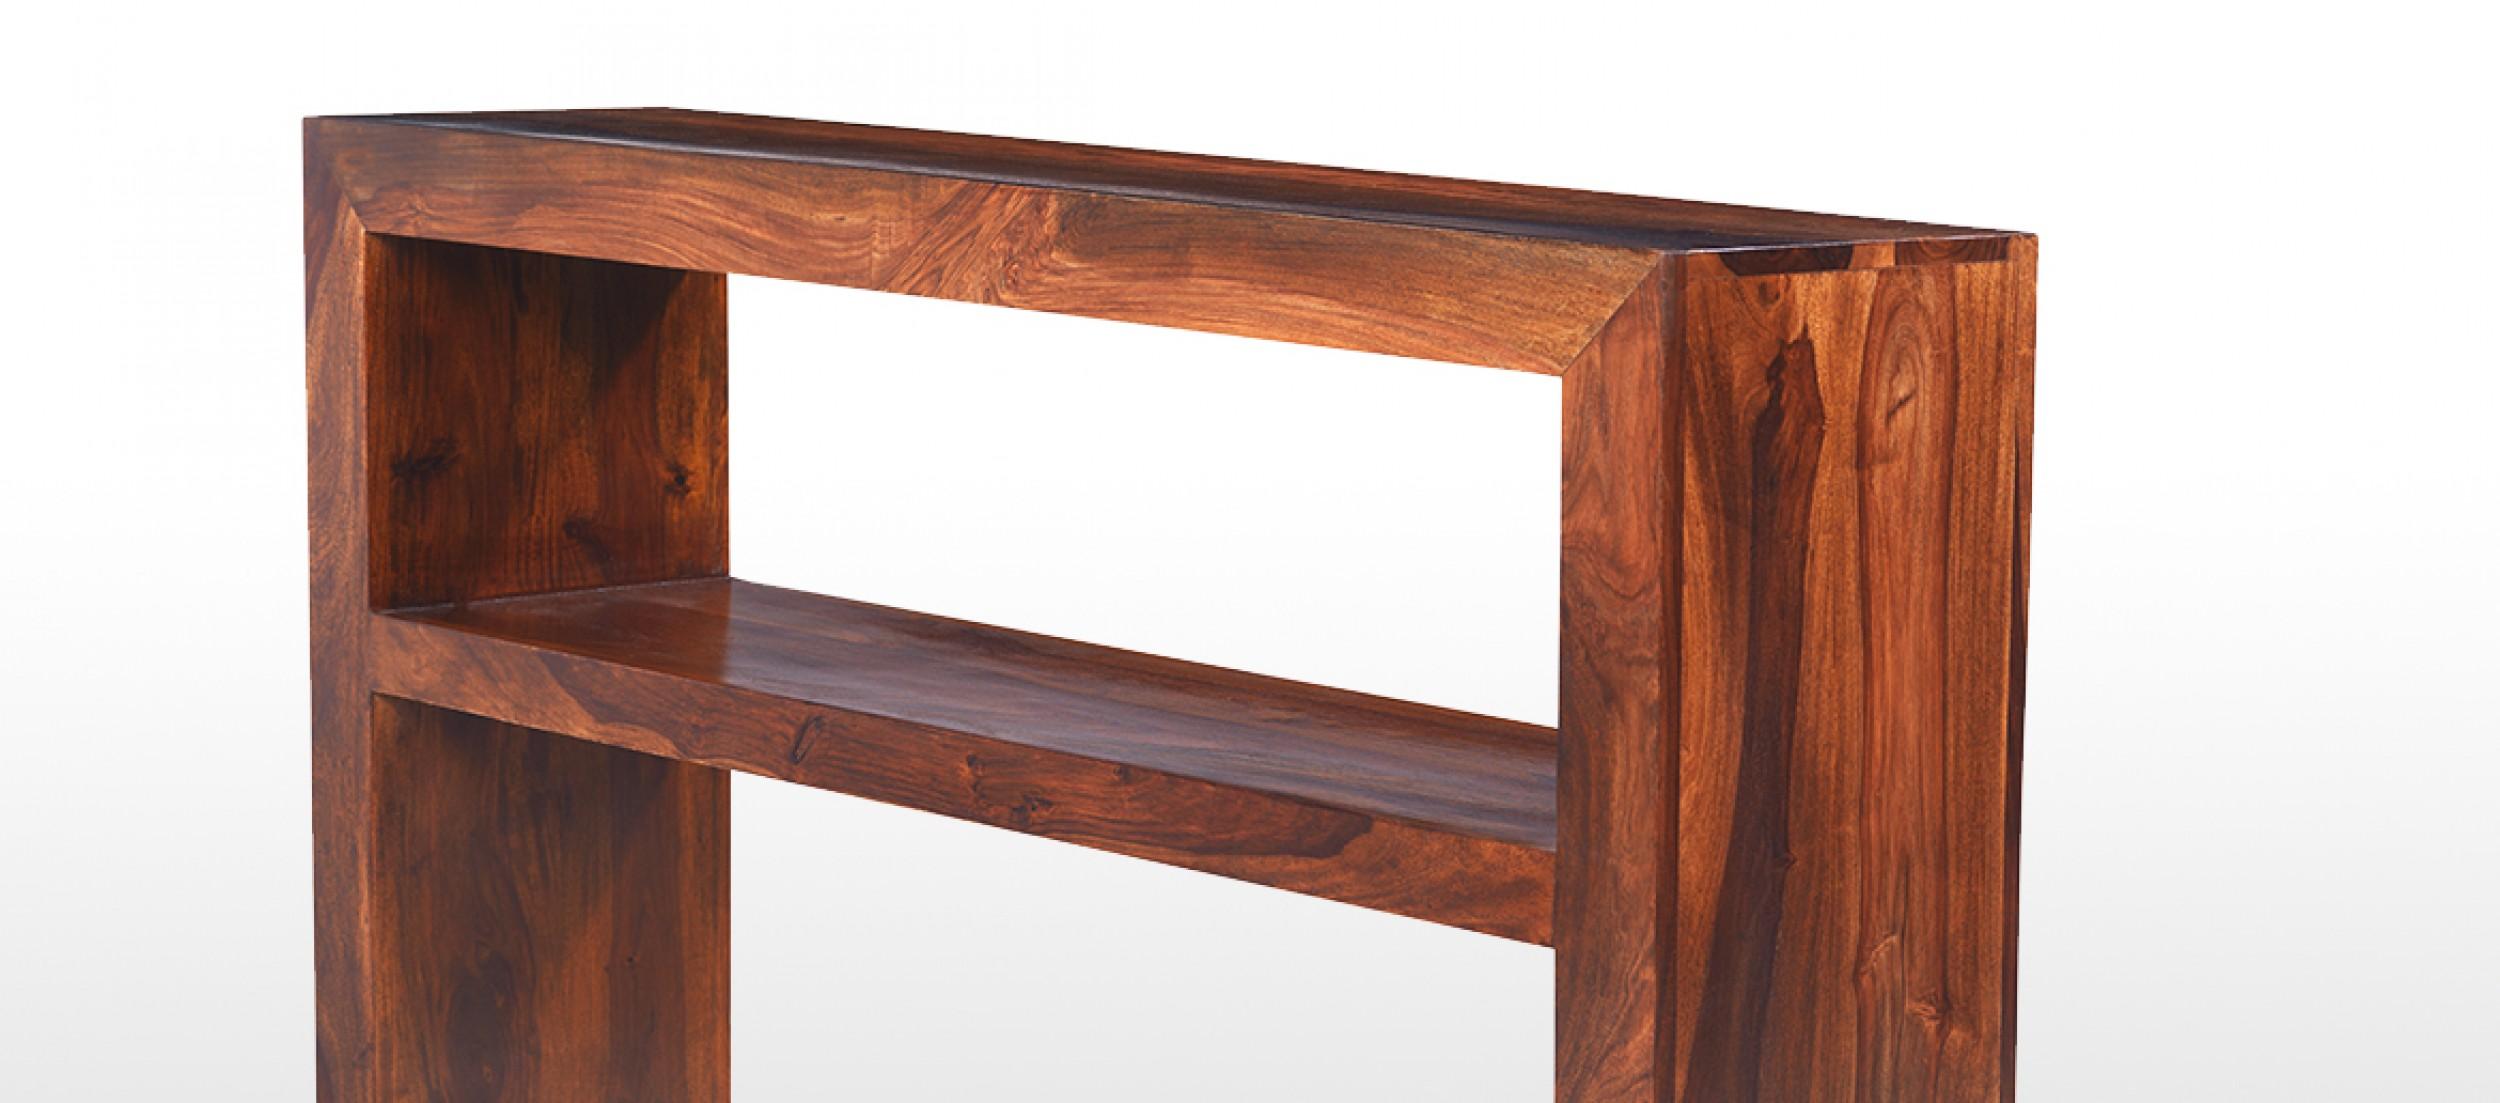 Cube sheesham console table quercus living cube sheesham console table geotapseo Image collections